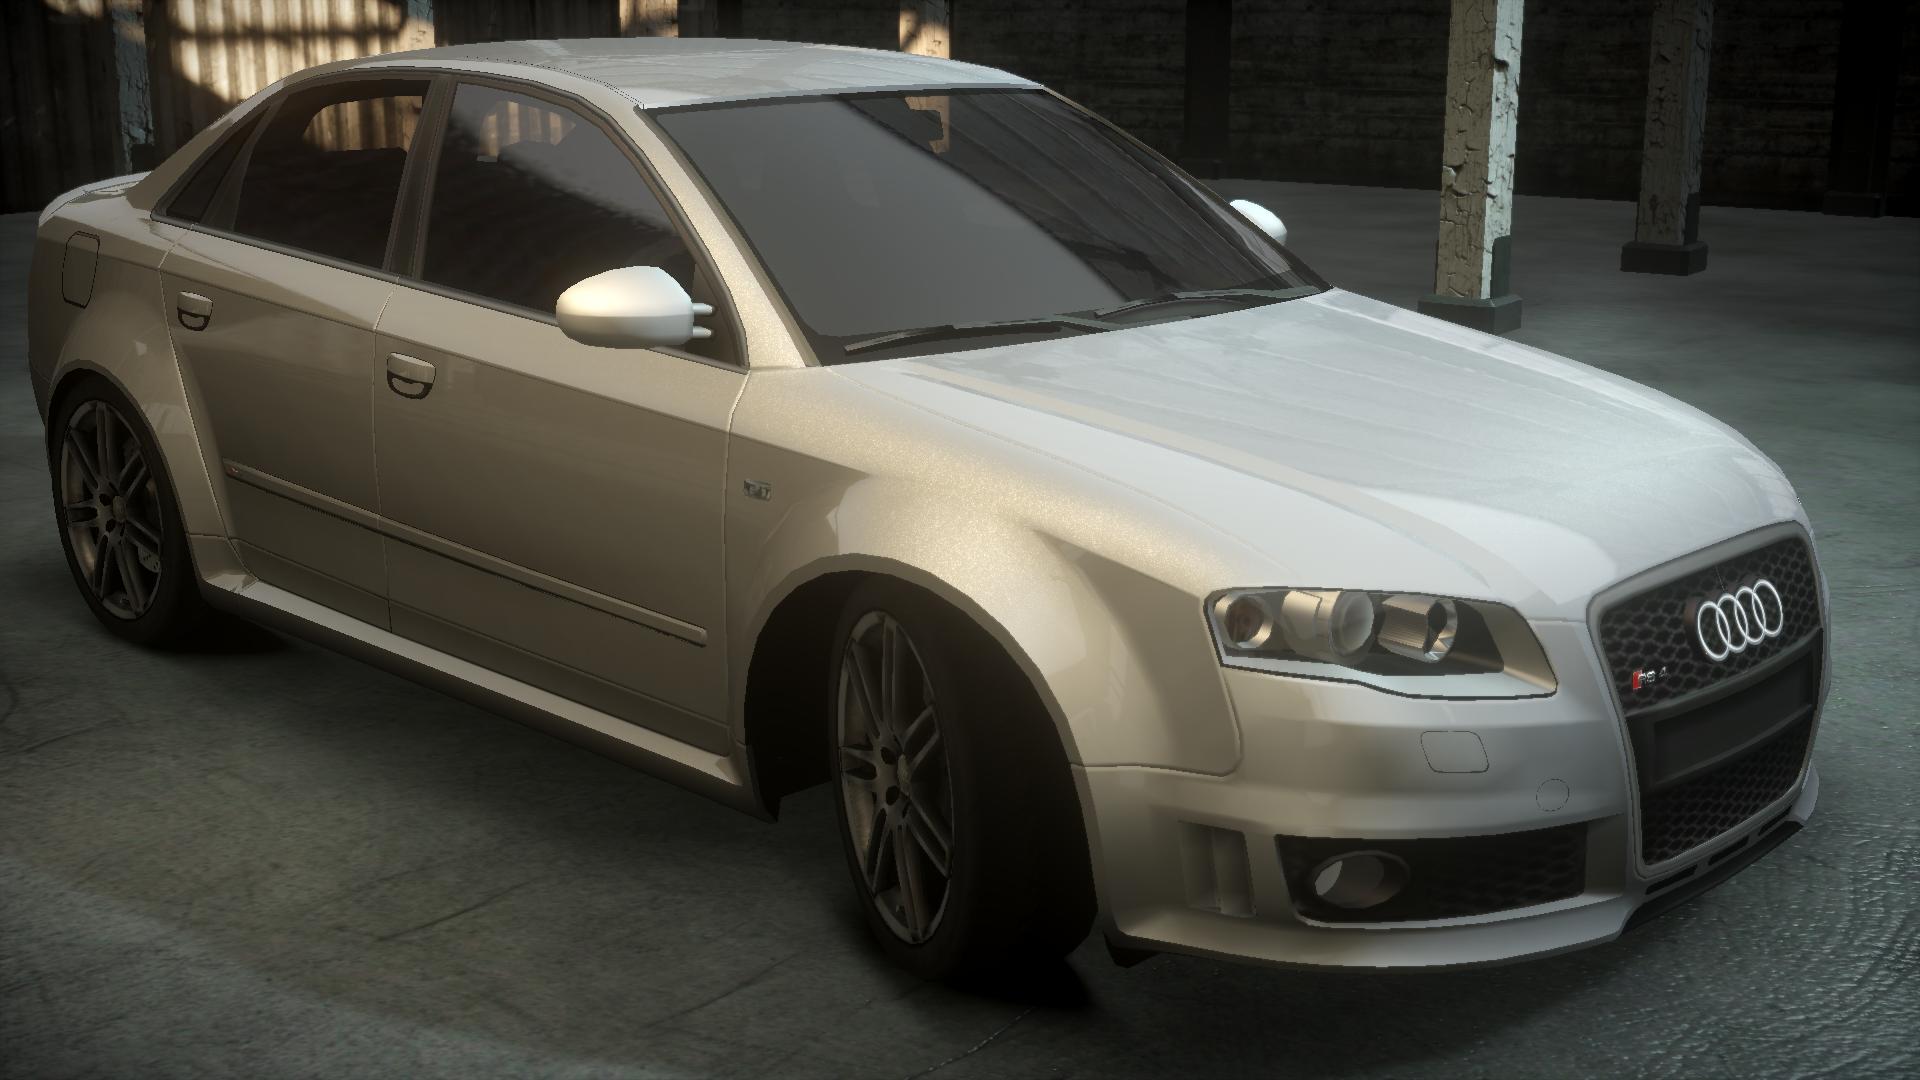 Audi RS Need For Speed Wiki FANDOM Powered By Wikia - Audi wiki